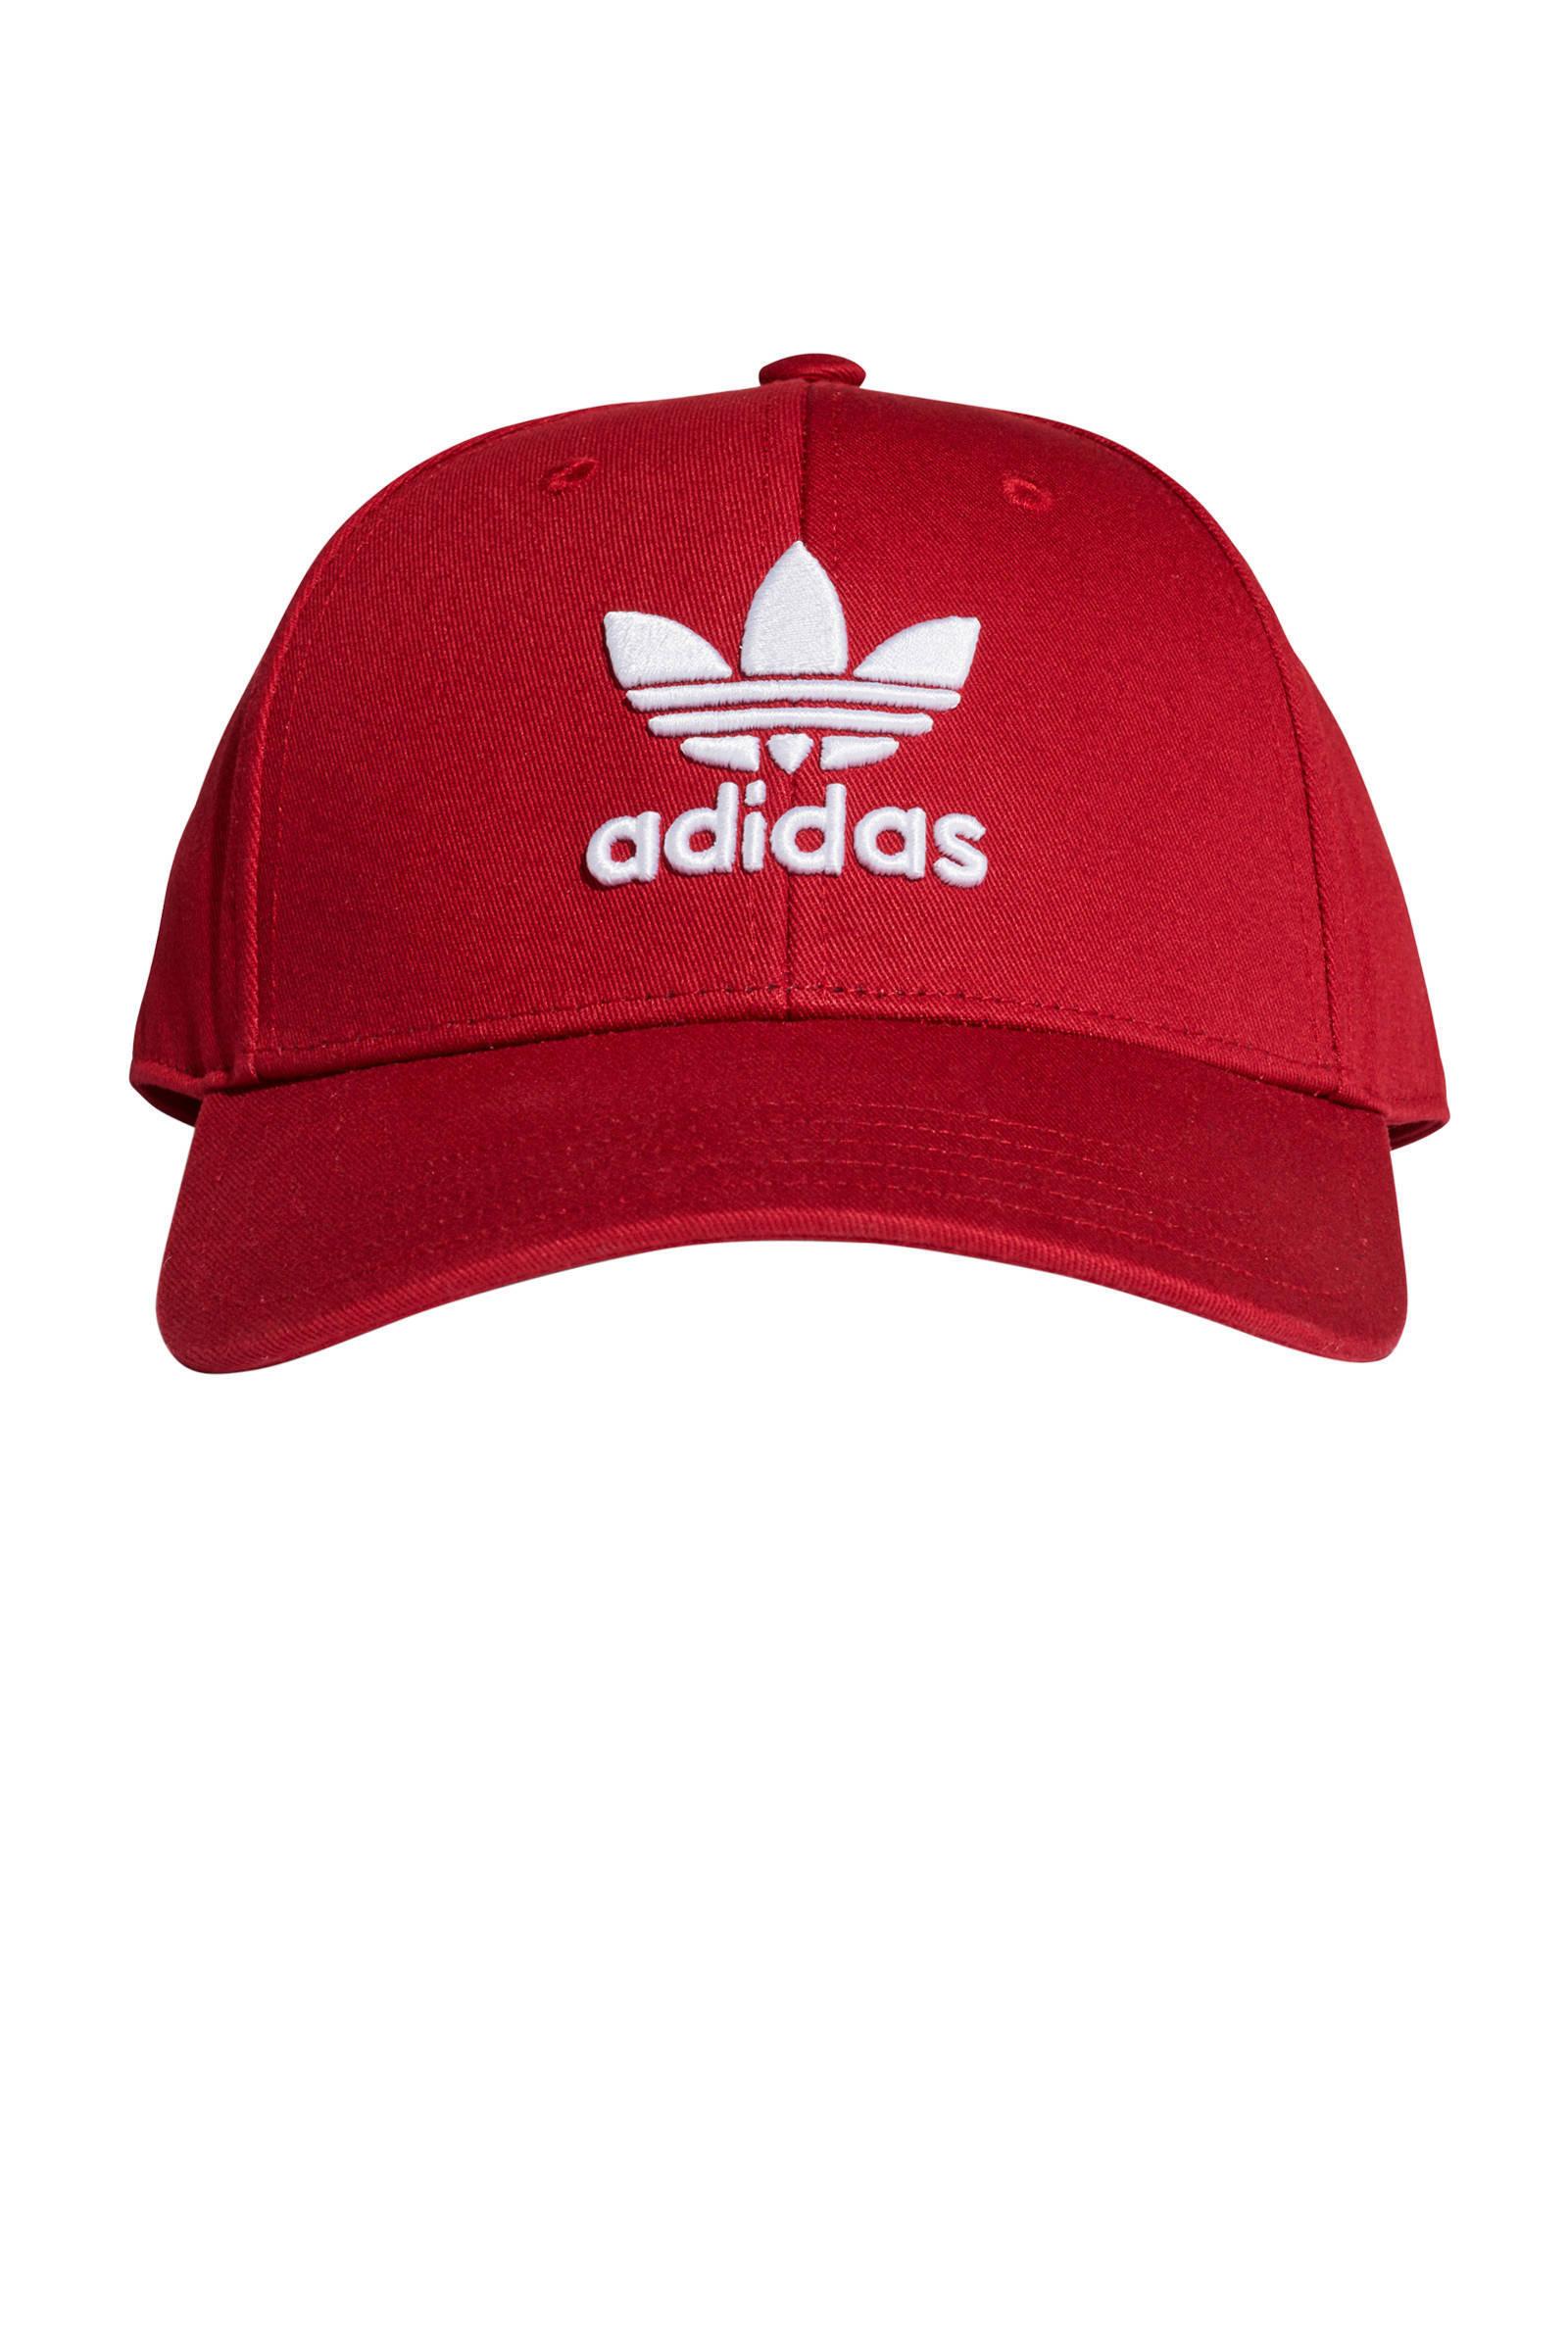 adidas Originals pet donkerroodwit | wehkamp